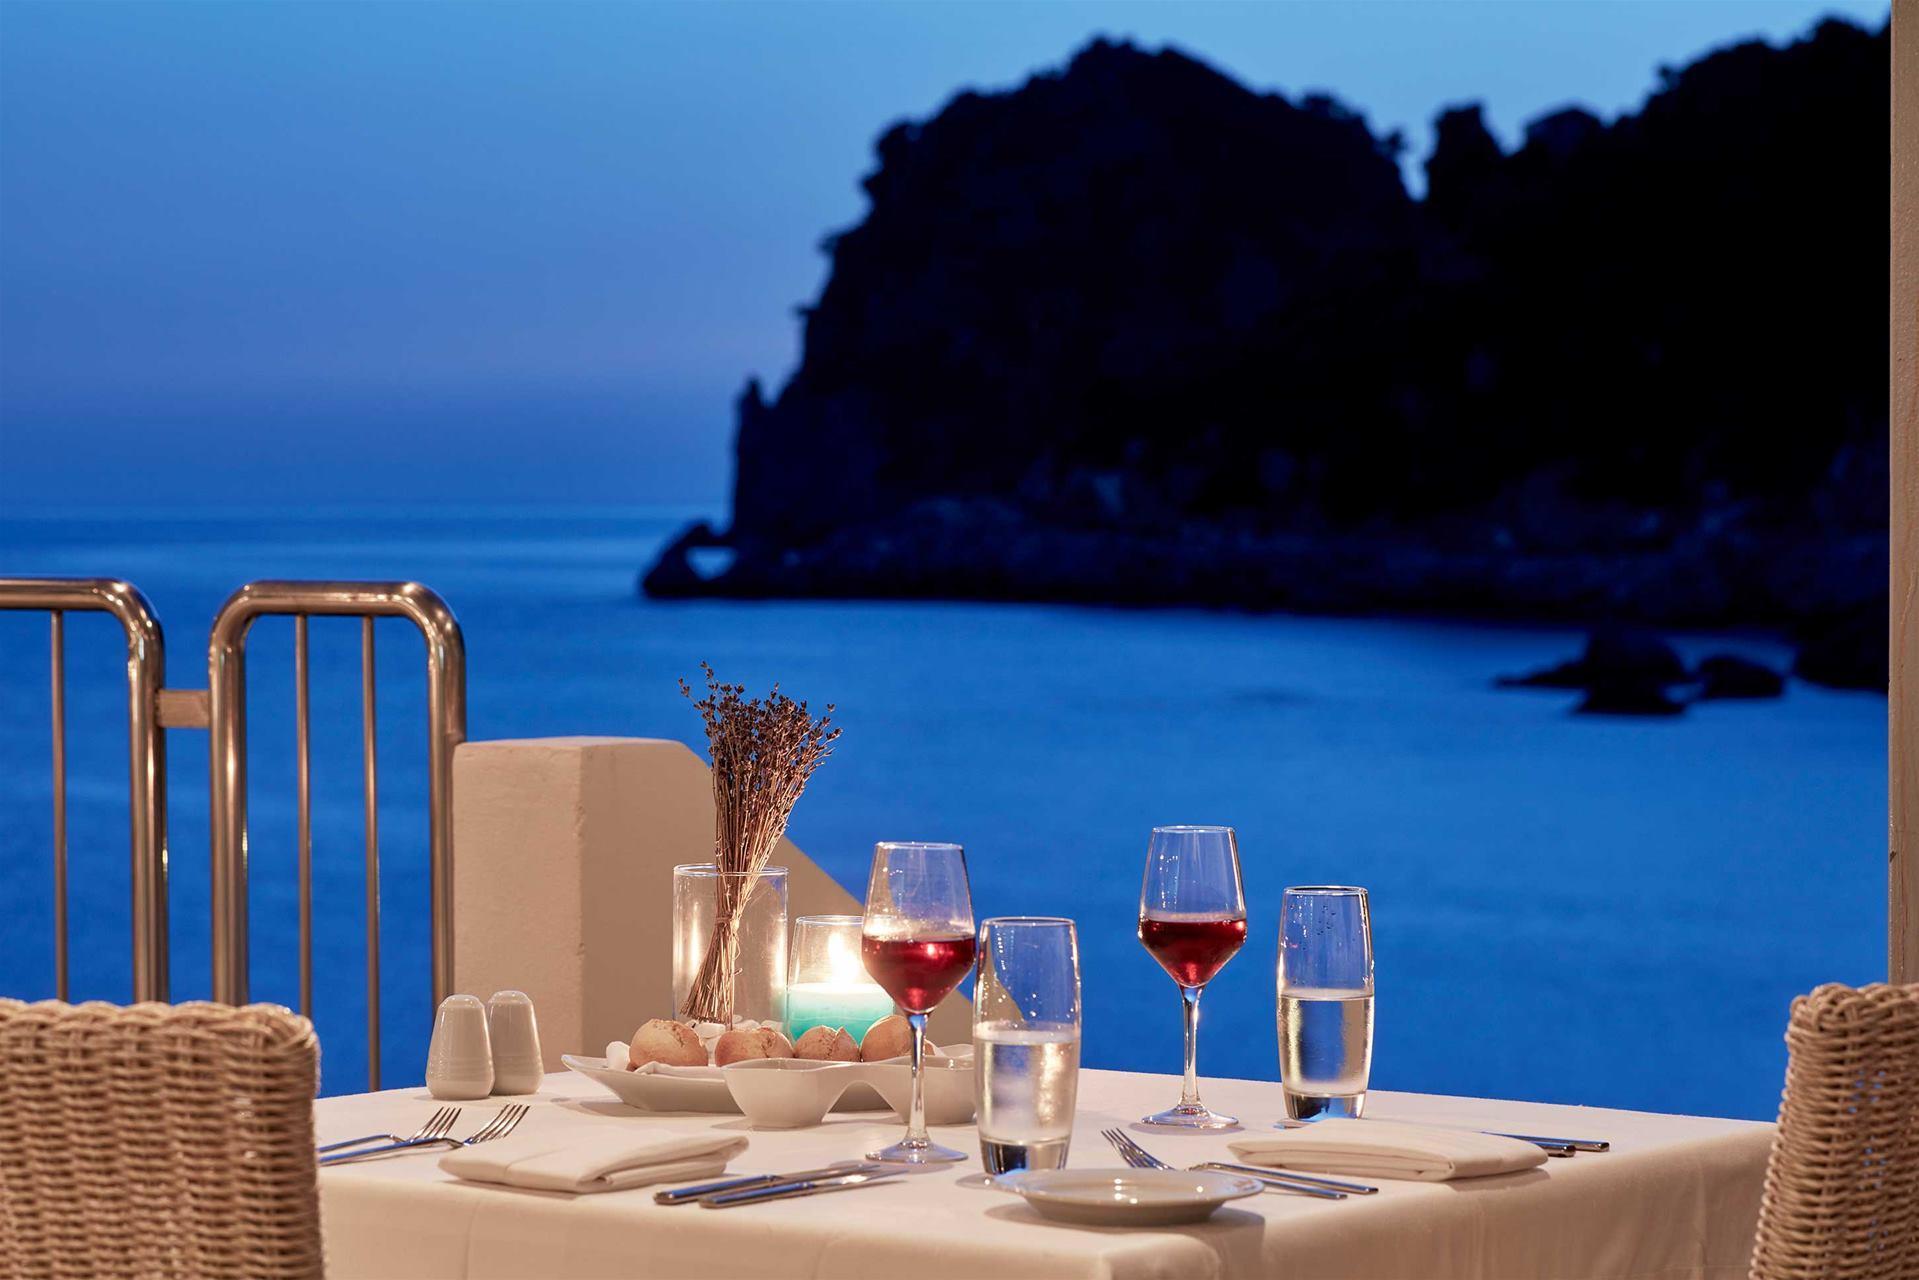 atlantica-grand-mediterraneo-resort-spa-genel-0011